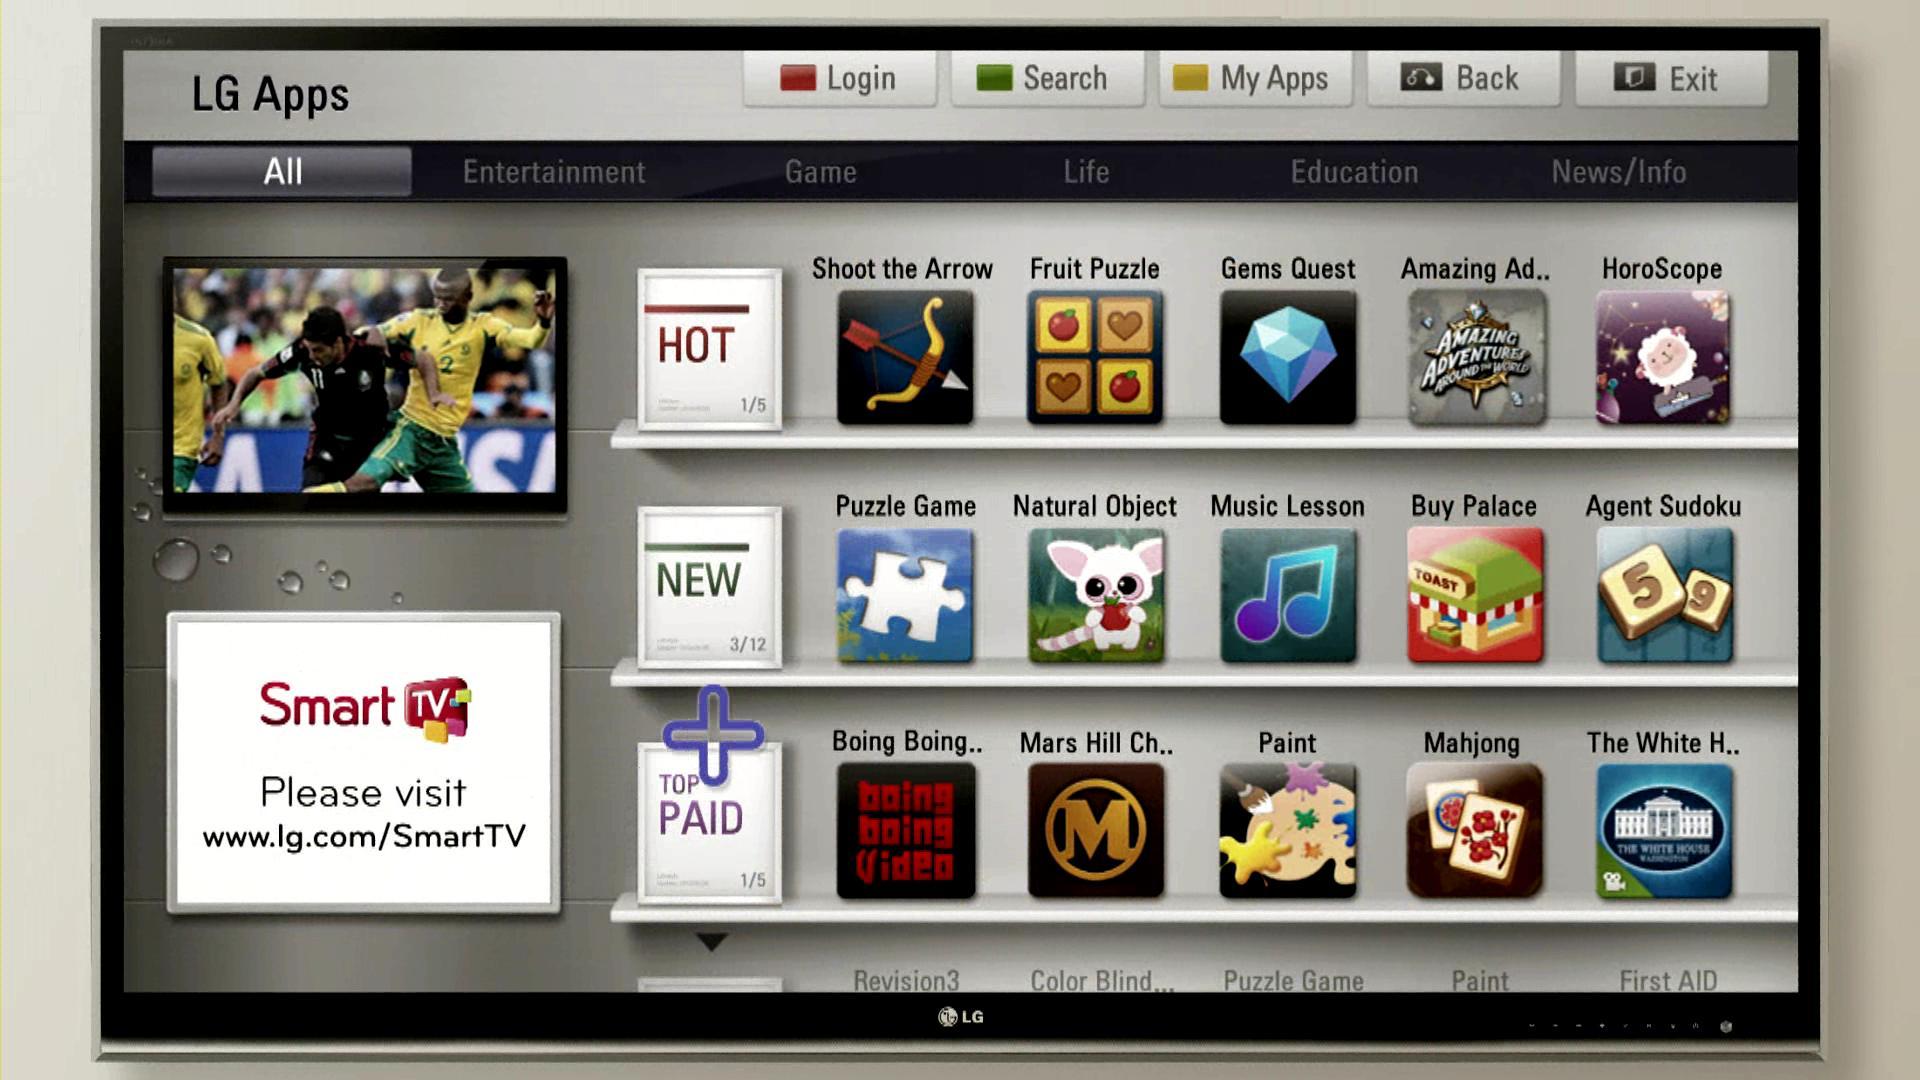 A screenshot of the new LG SmartTV platform home screen